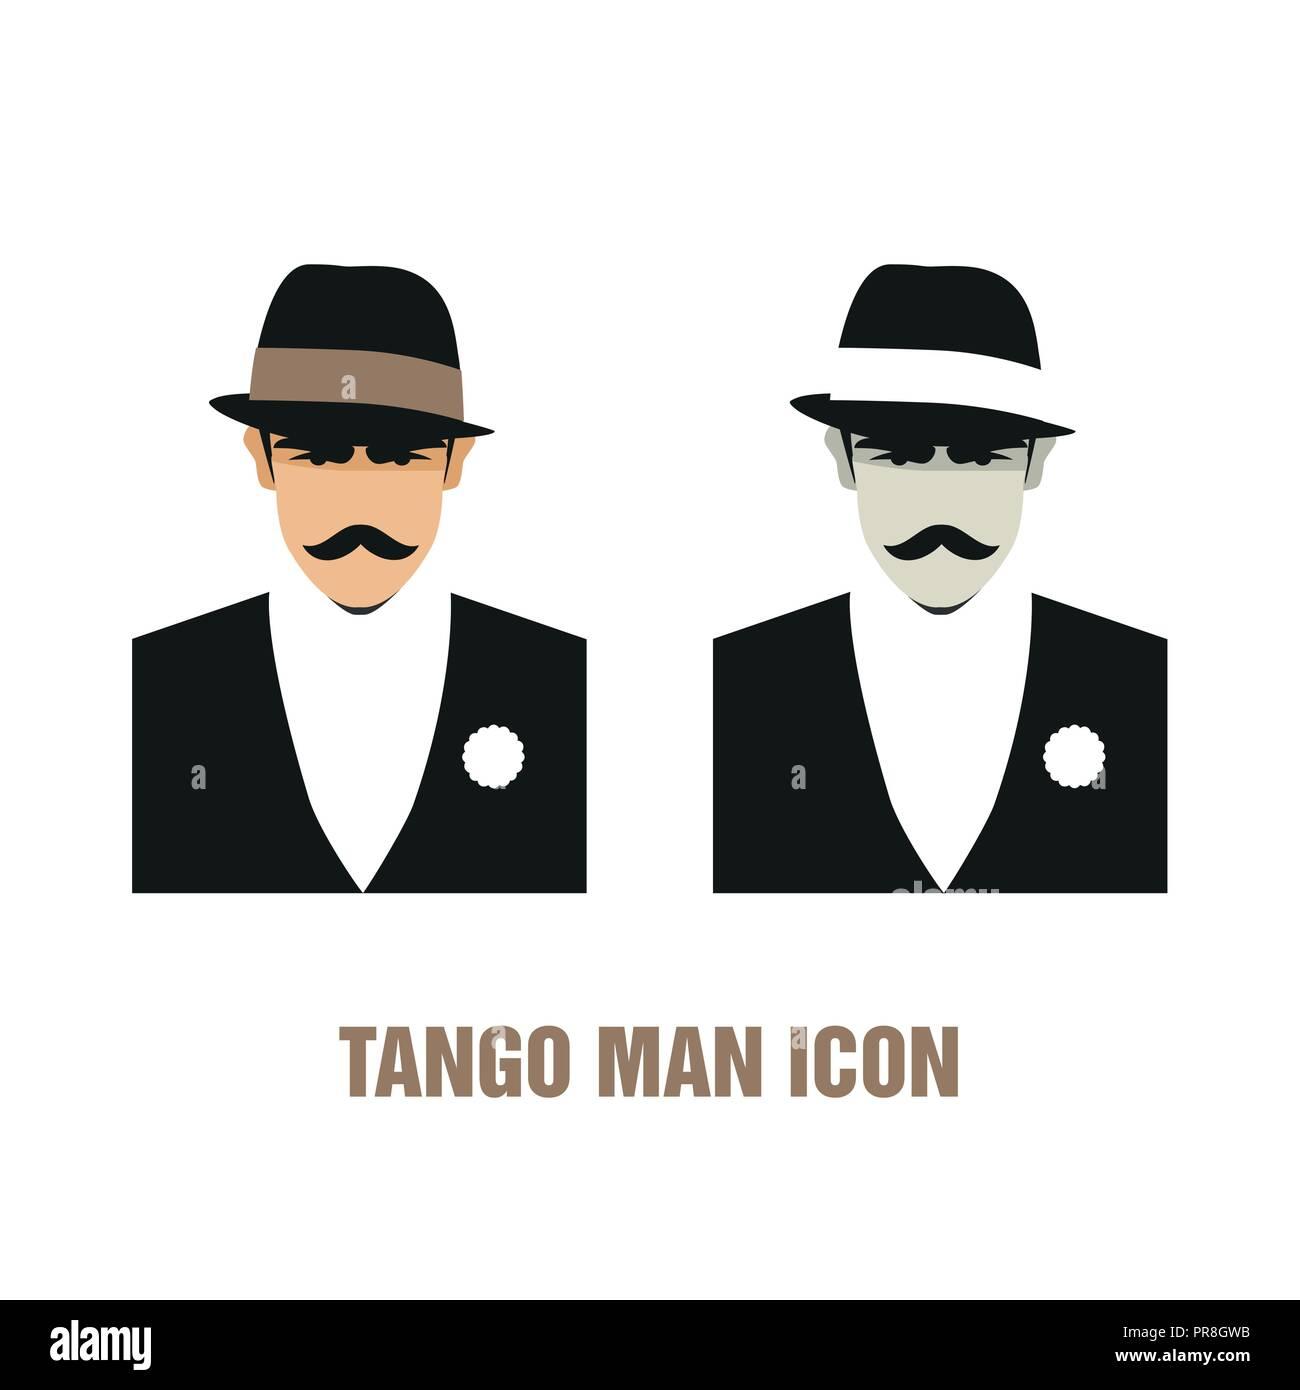 Tango man icon  Vector illustration  Good for logo Stock